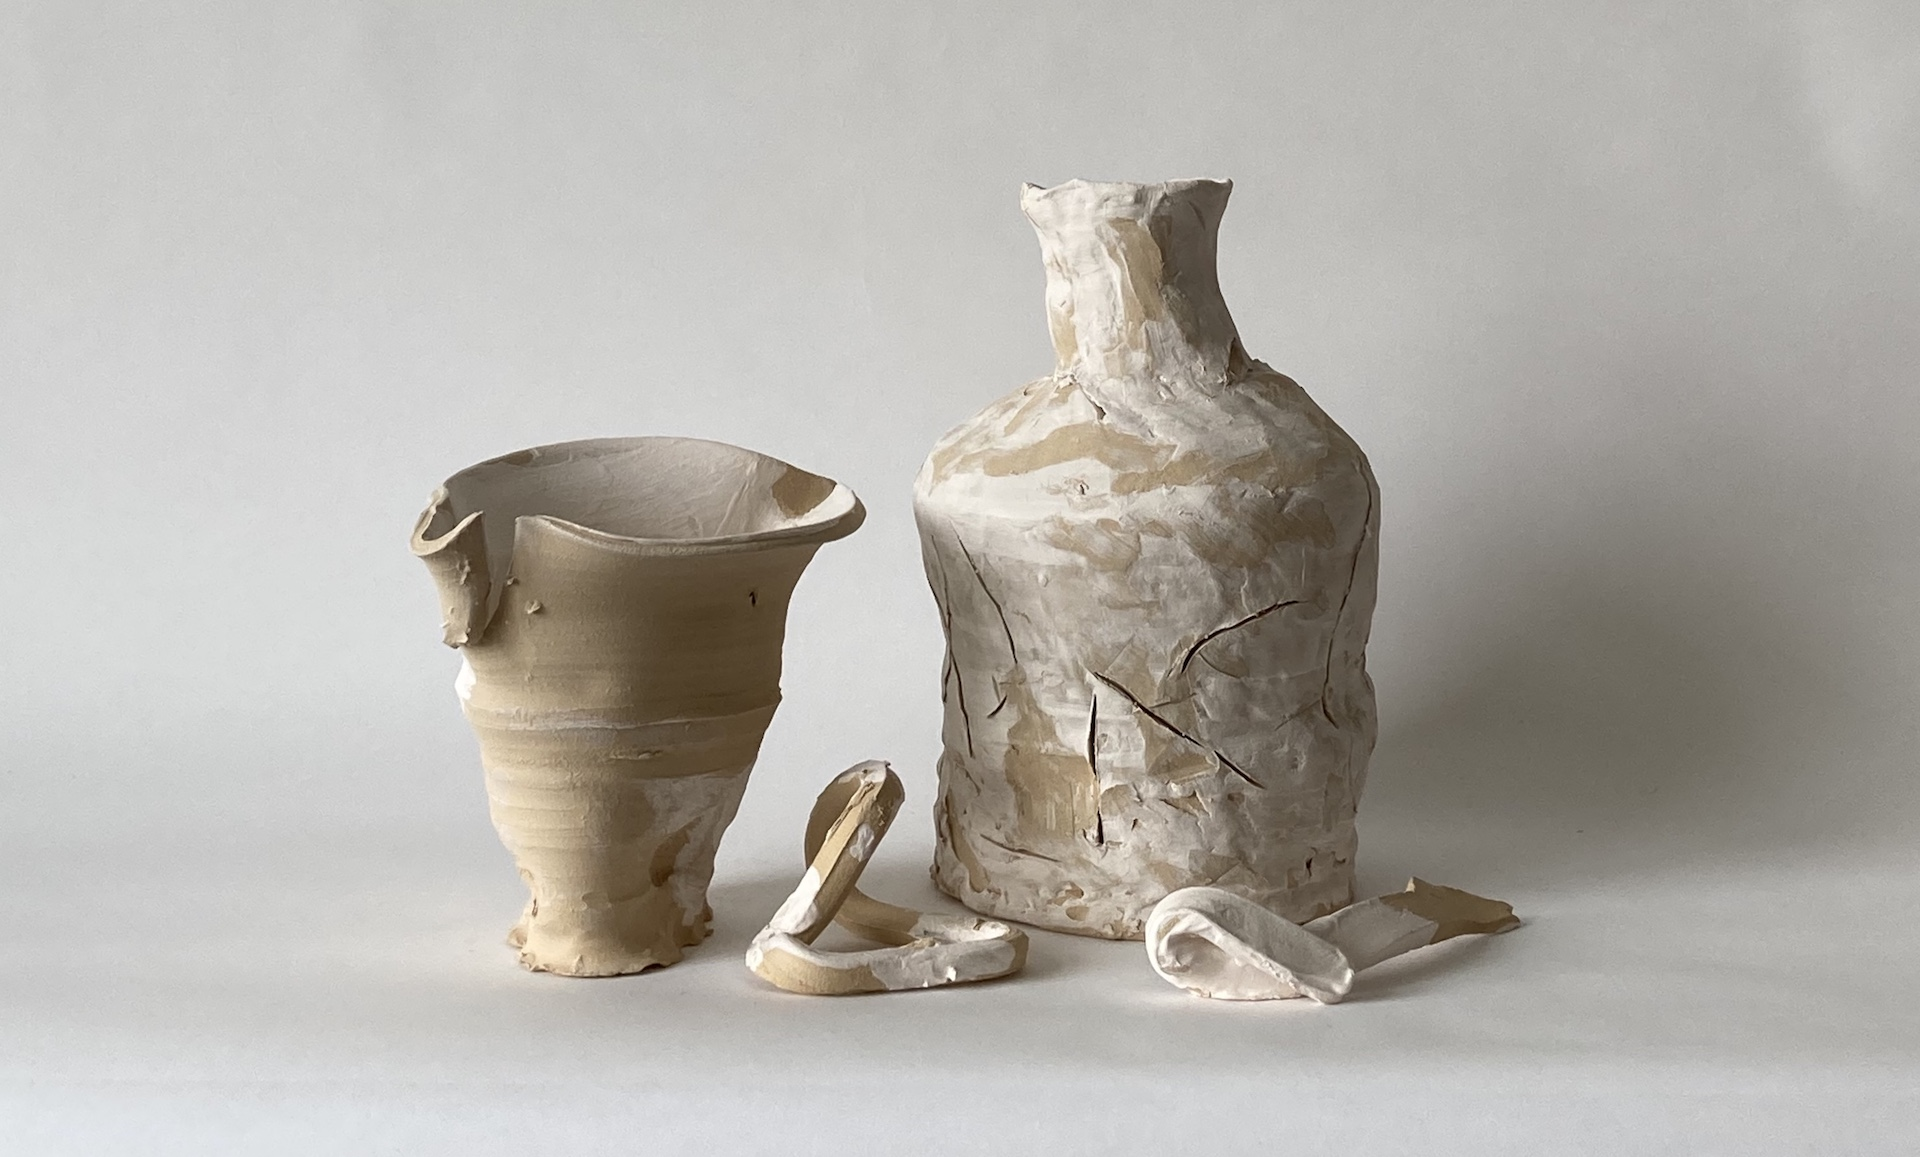 Celeste McEvoy & Gareth Barker's ceramics.